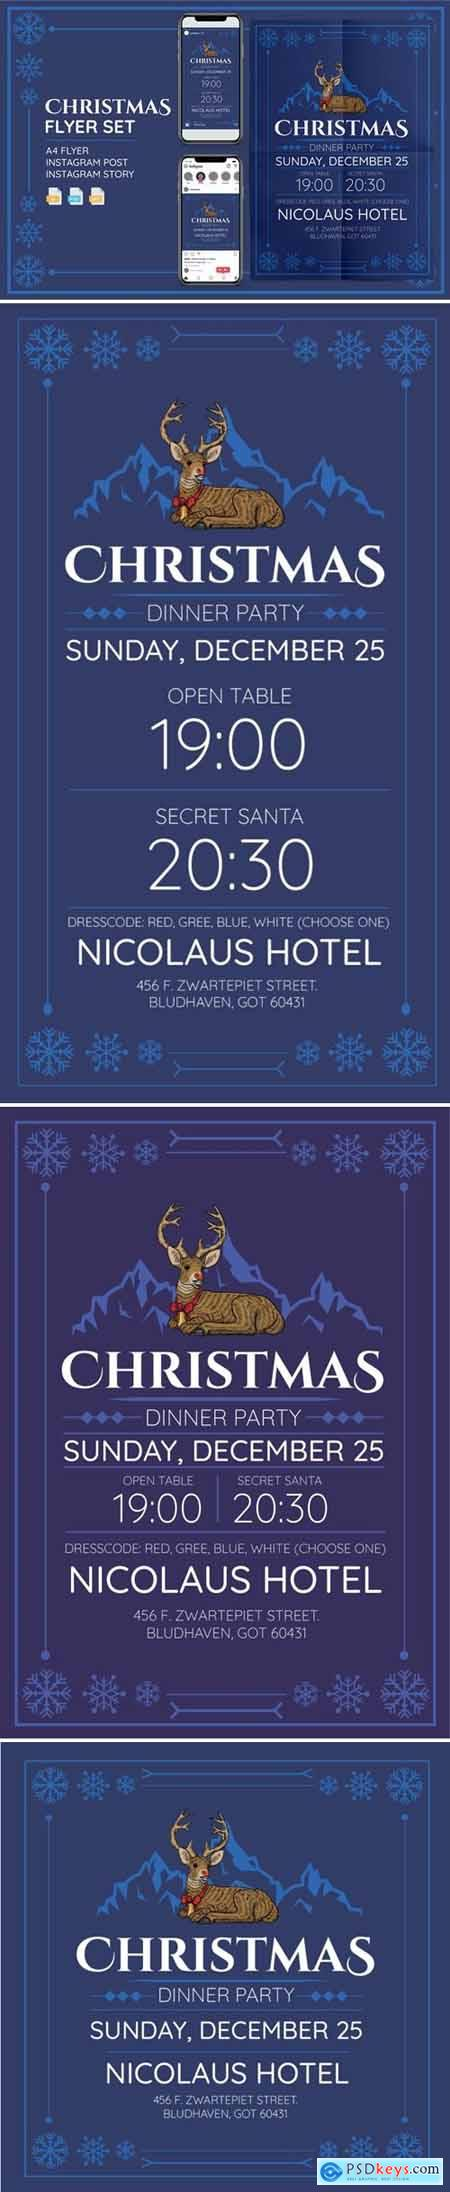 Christmass Flyer Set - Print and Social Media Pack LEFYU94